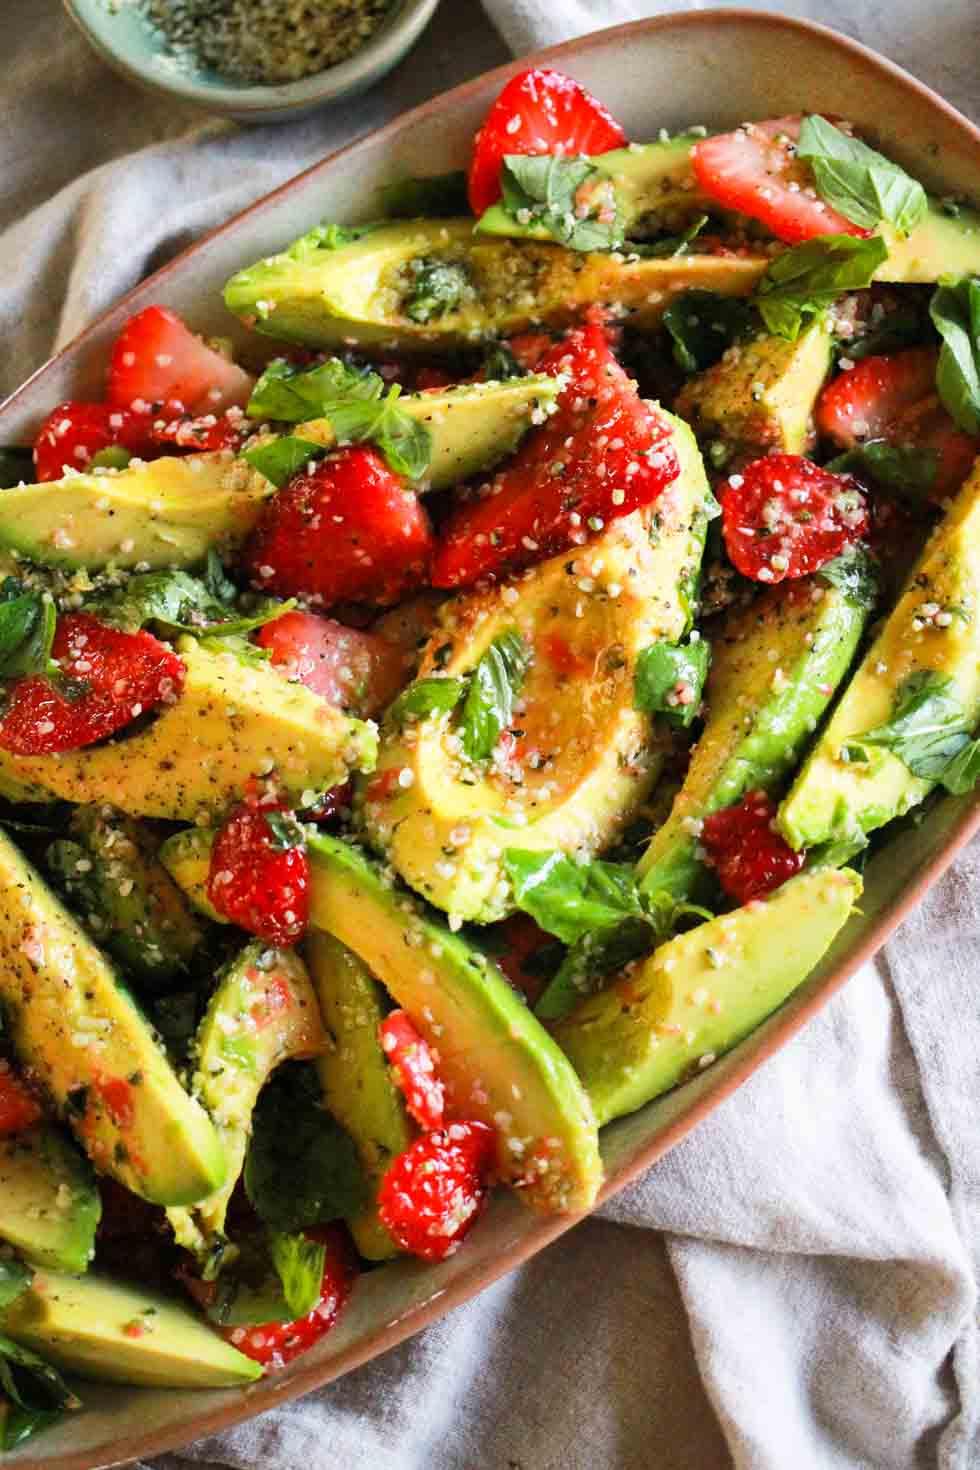 Strawberry avocado hemp salad on a rectangular platter with linen napkin.